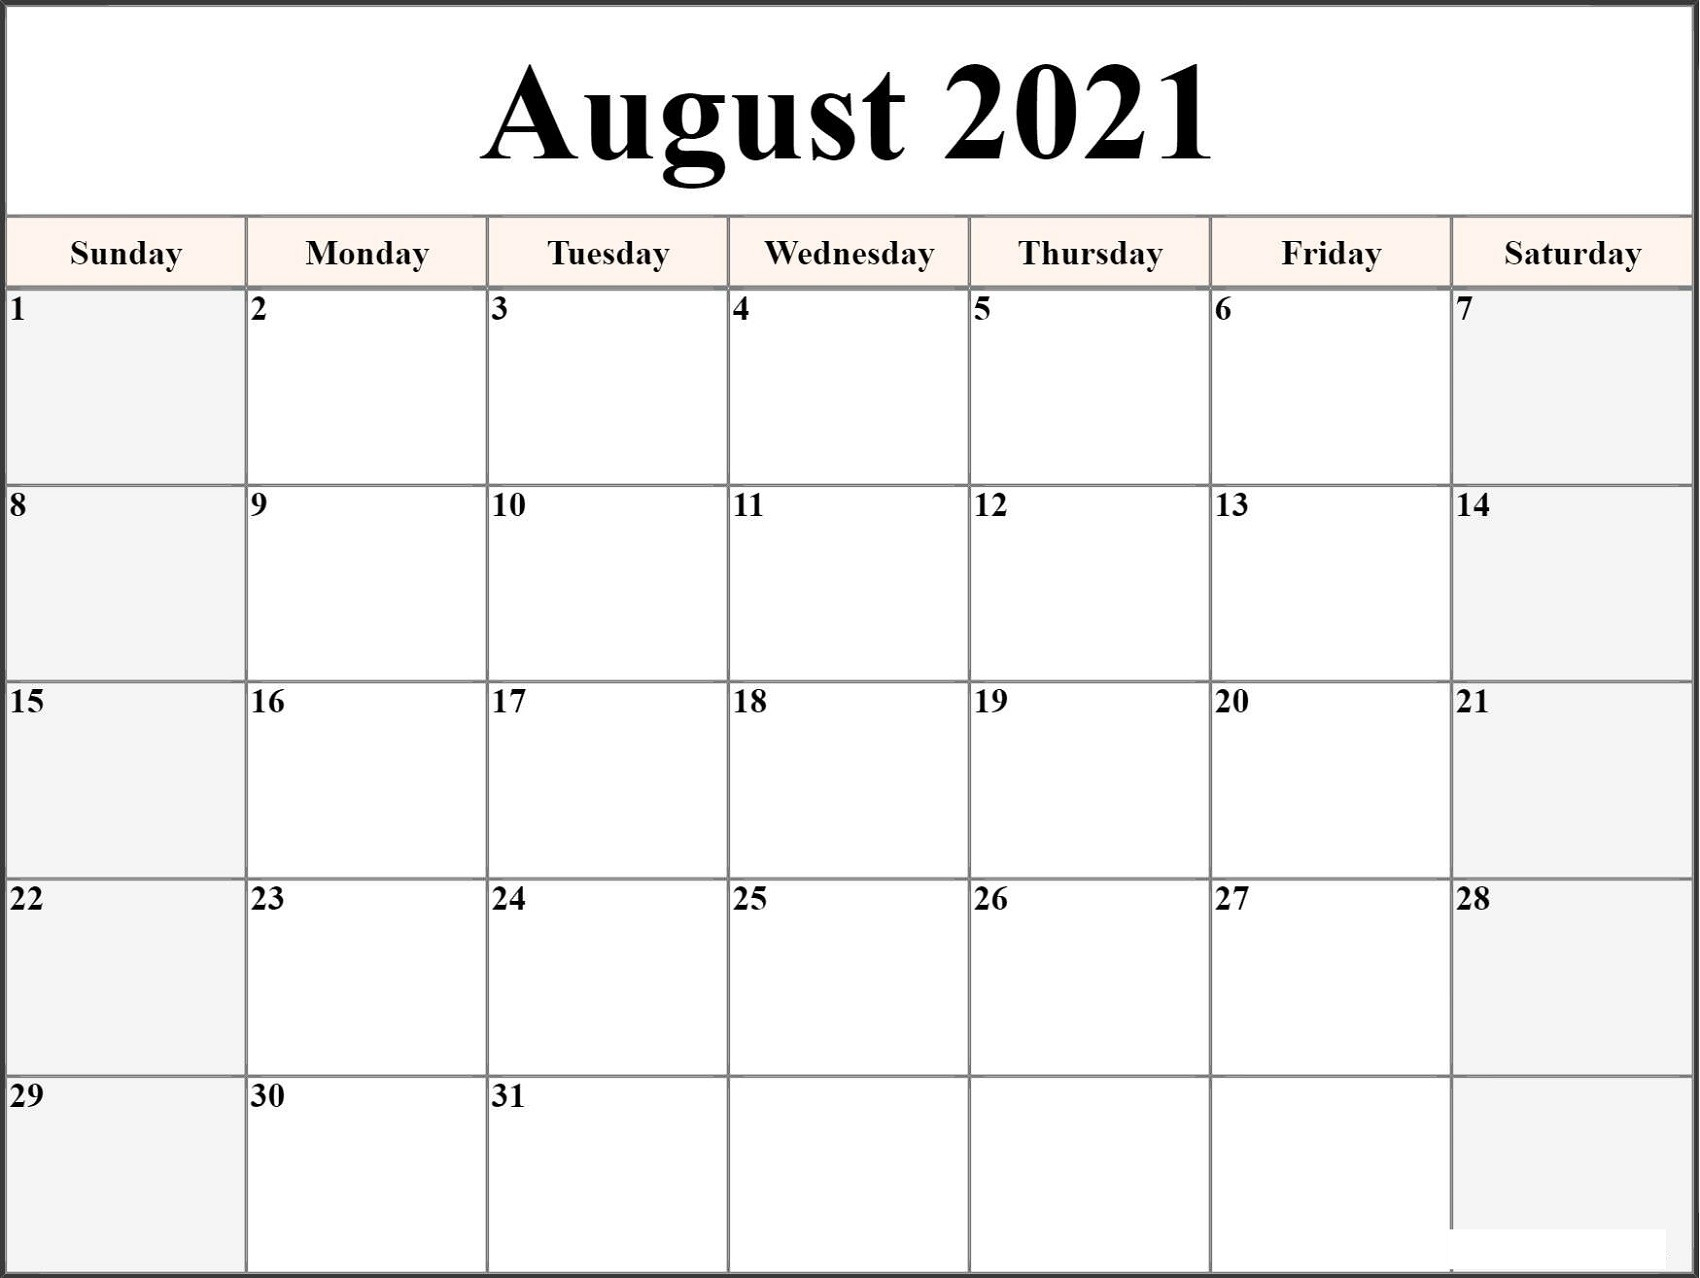 Print Calendar In Microsoft Word | Ten Free Printable in 2021 Word Calendar Wincalendar